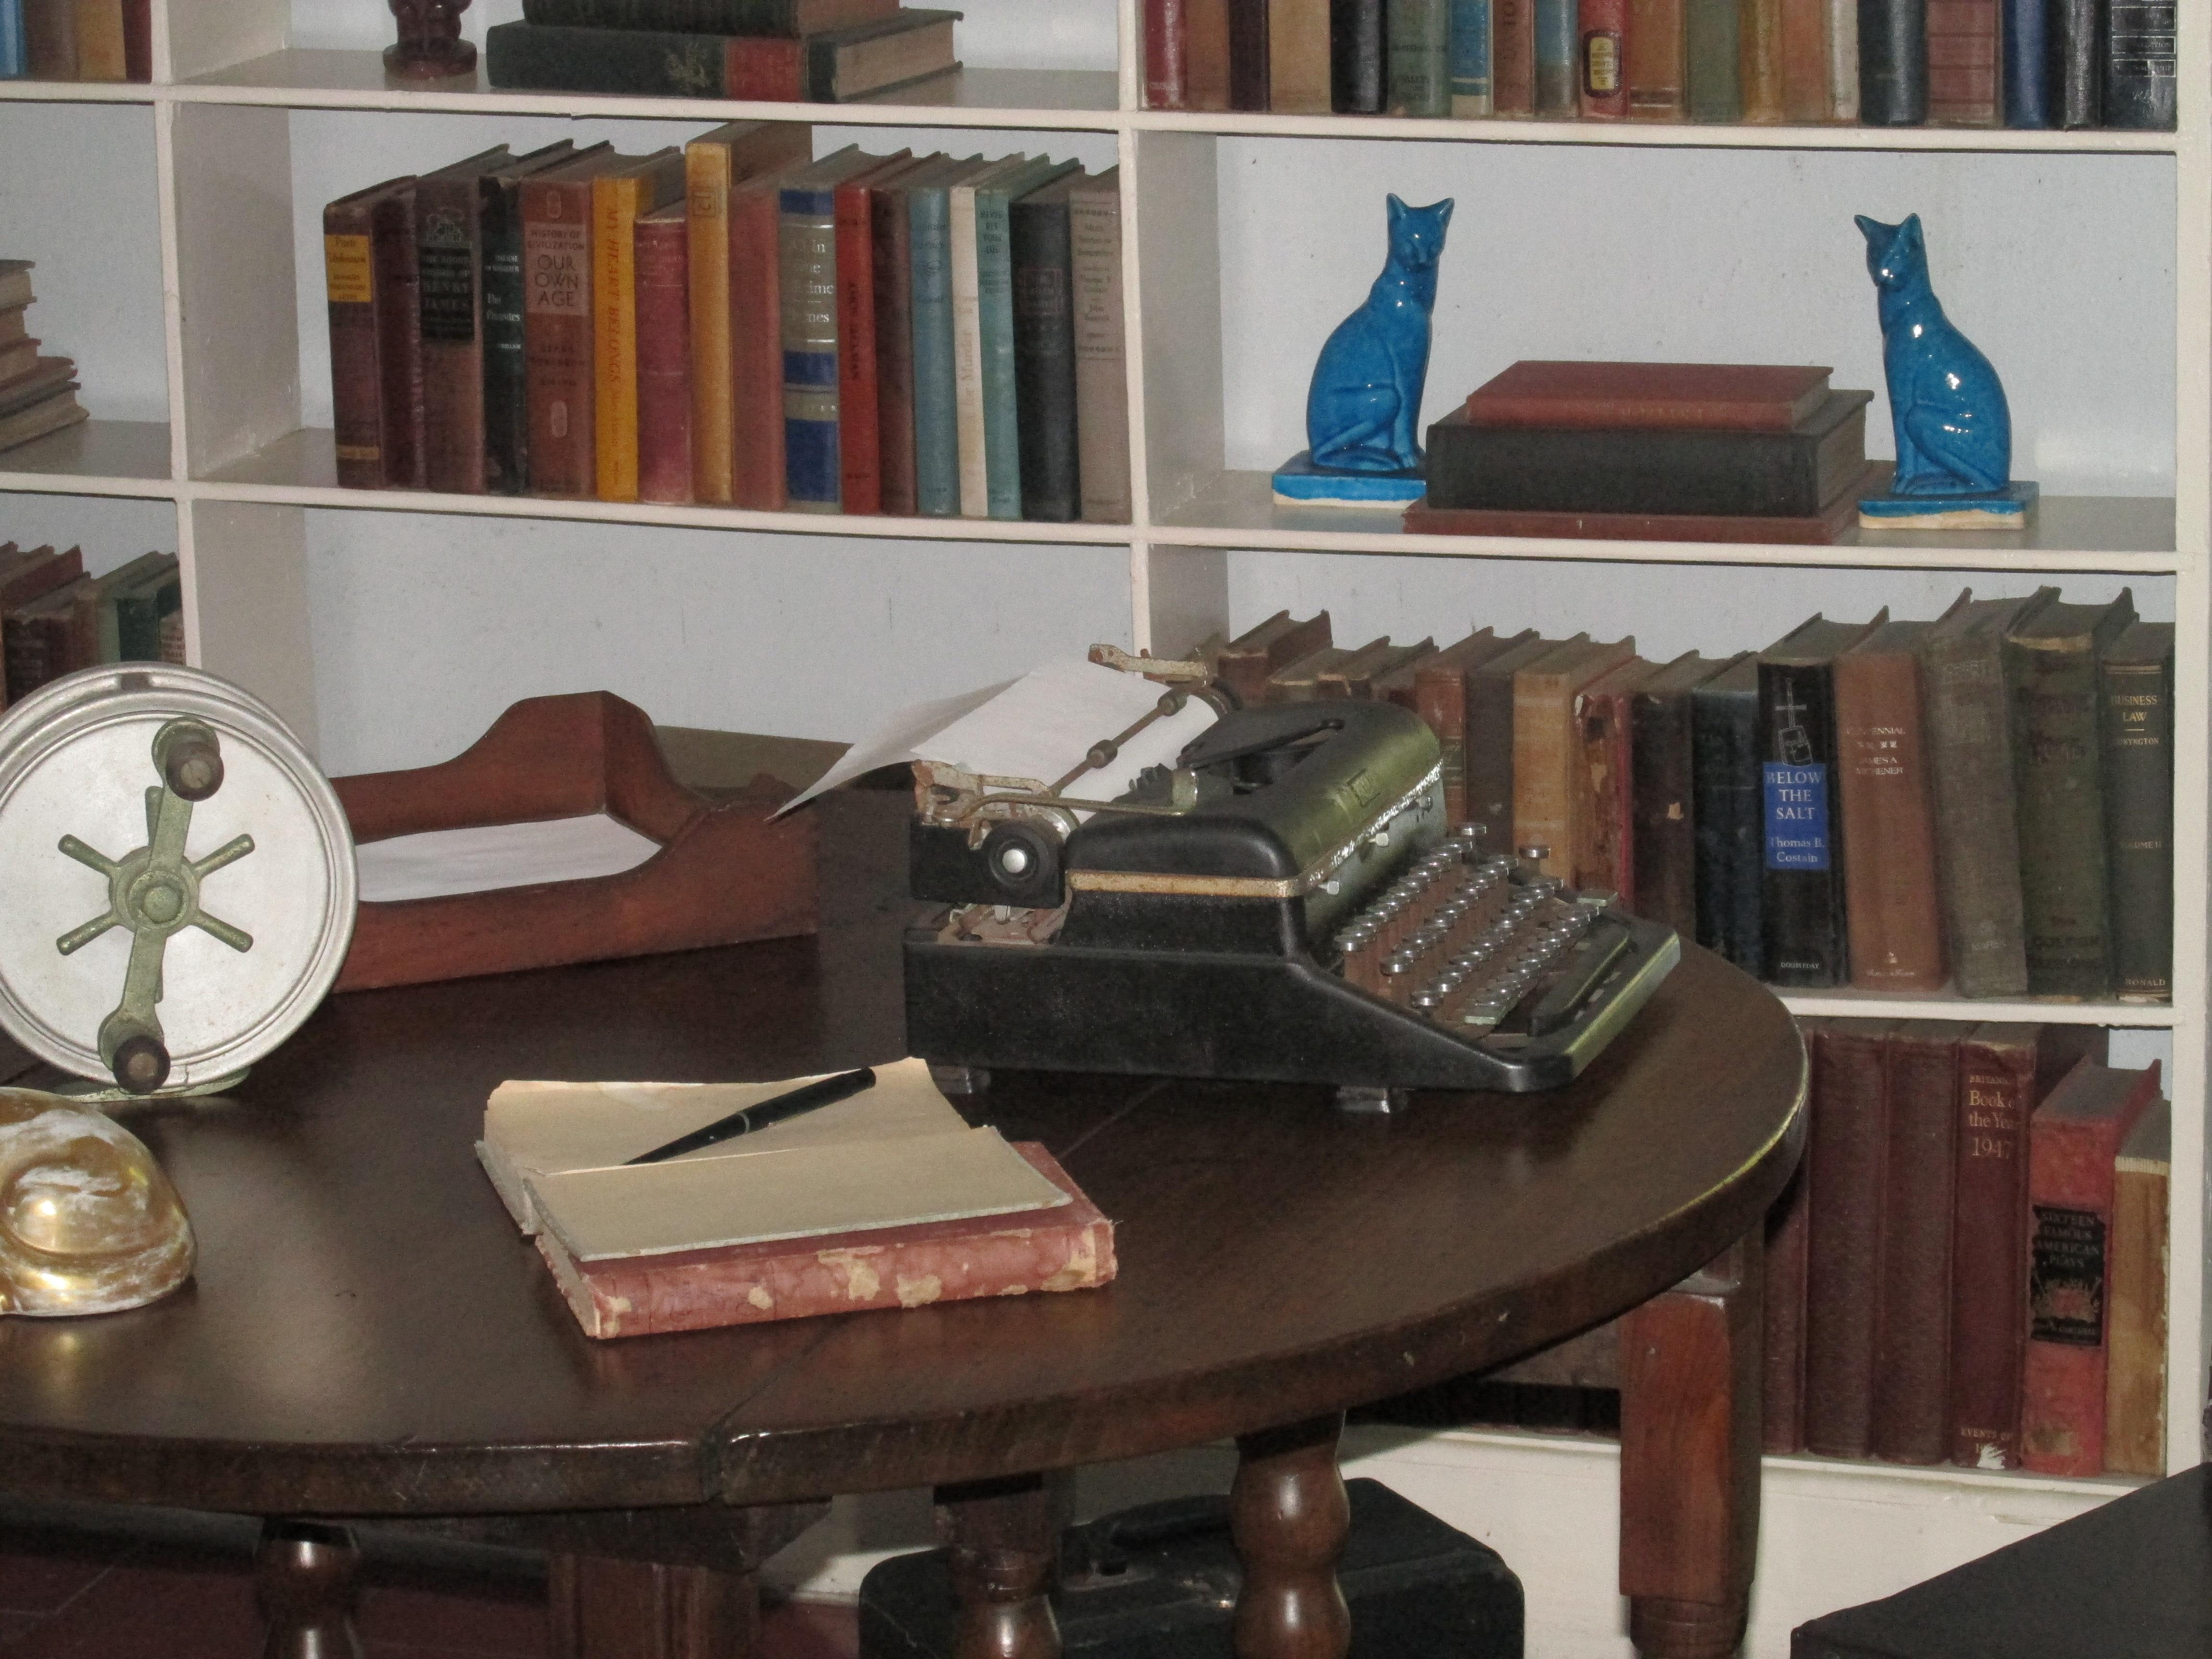 Ernest Hemingways Home Office In Key West Fla Photo Credit M Ciavardini